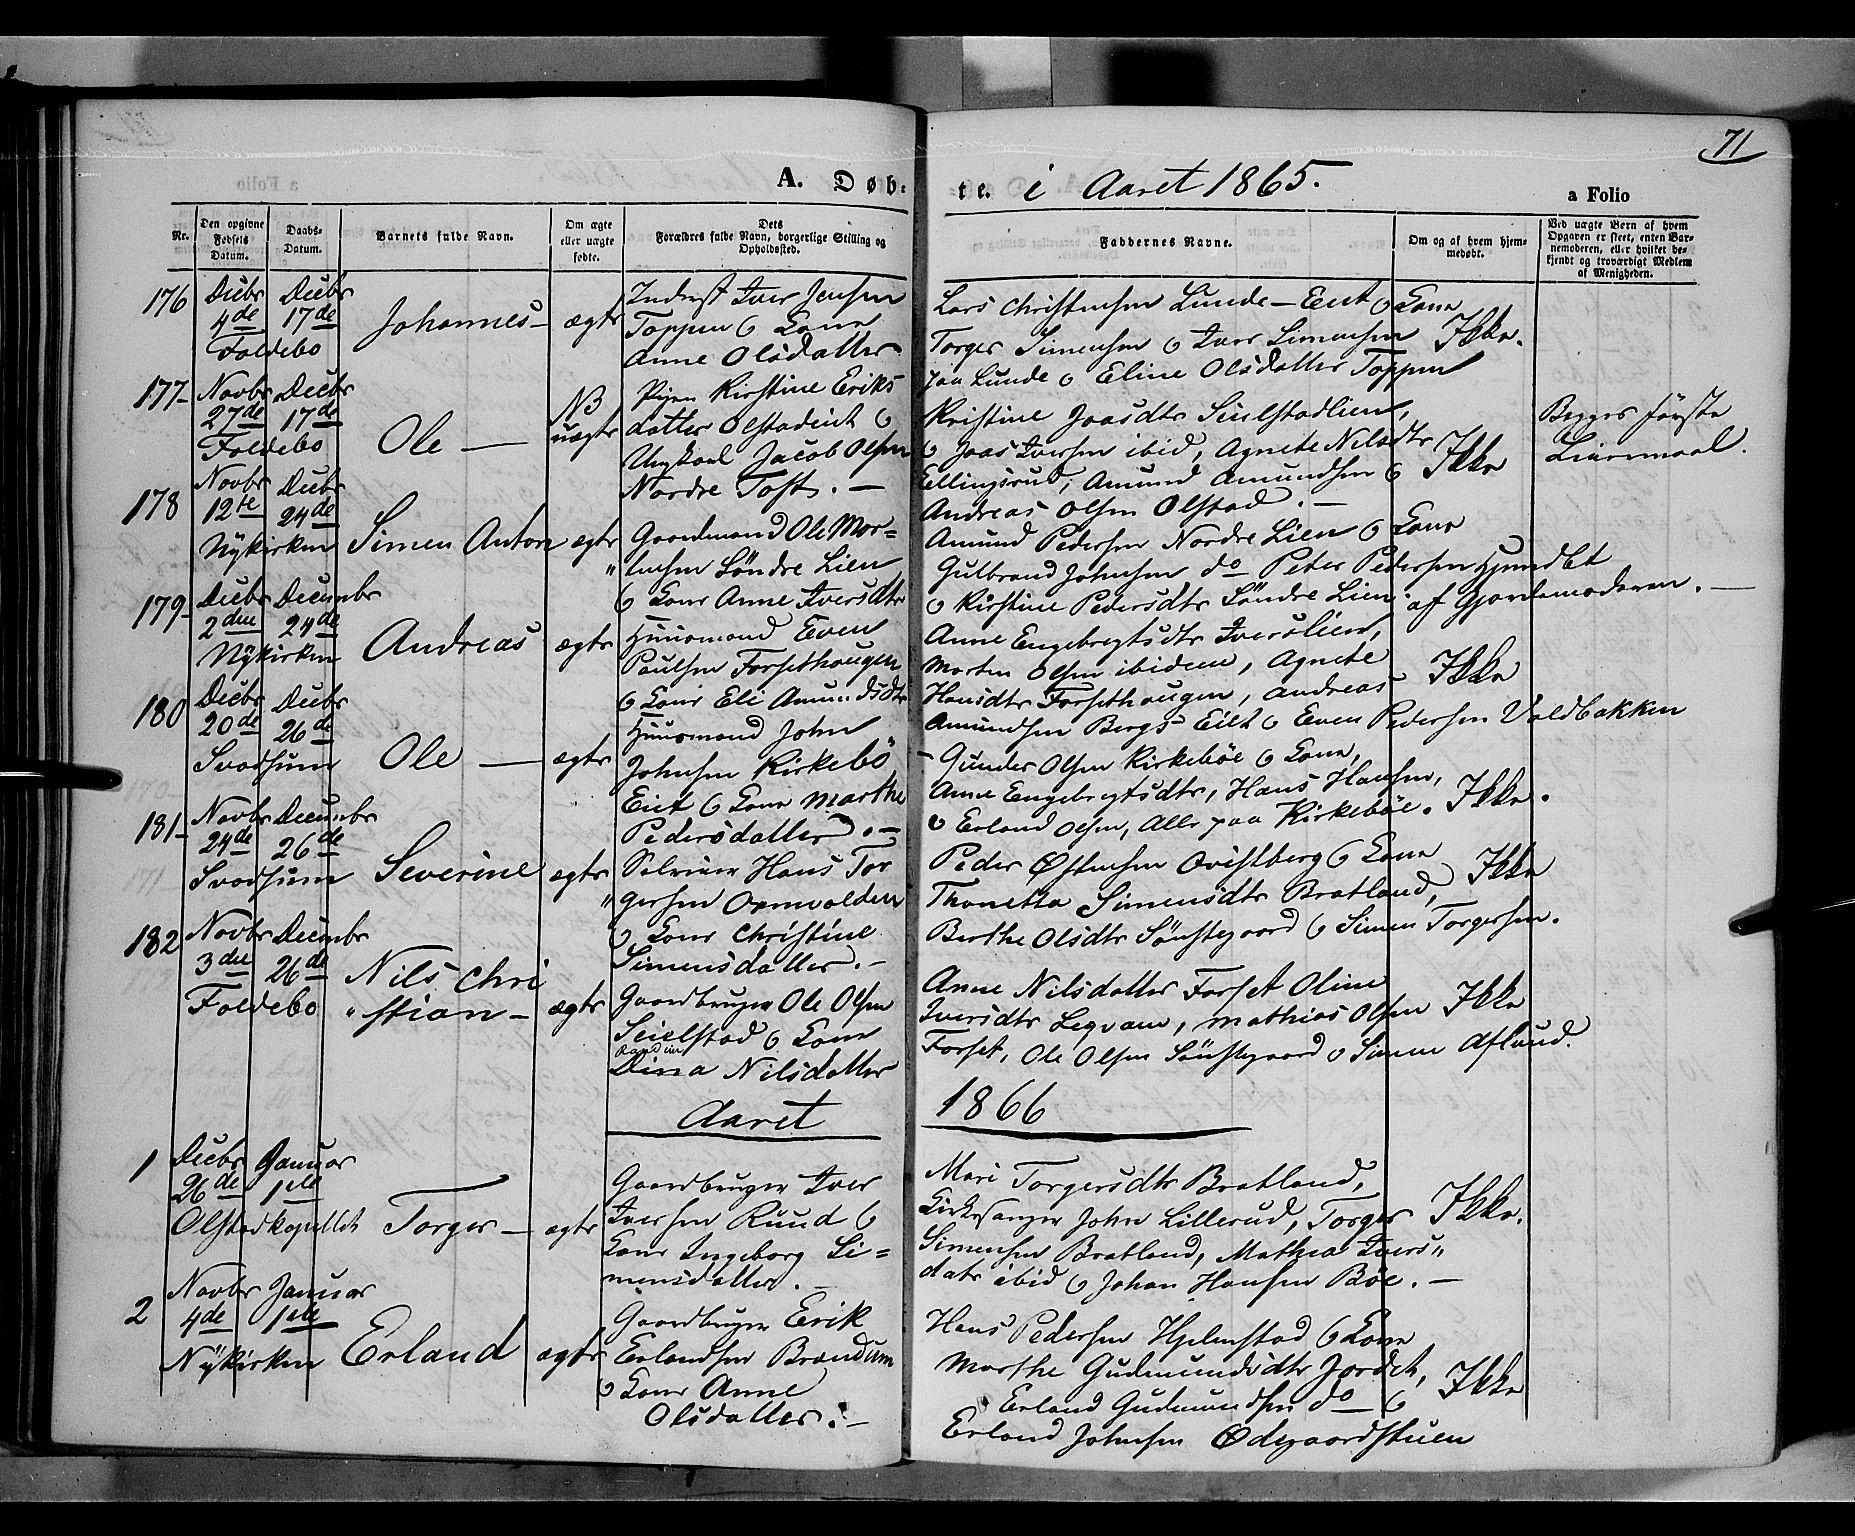 SAH, Gausdal prestekontor, Ministerialbok nr. 9, 1862-1873, s. 71